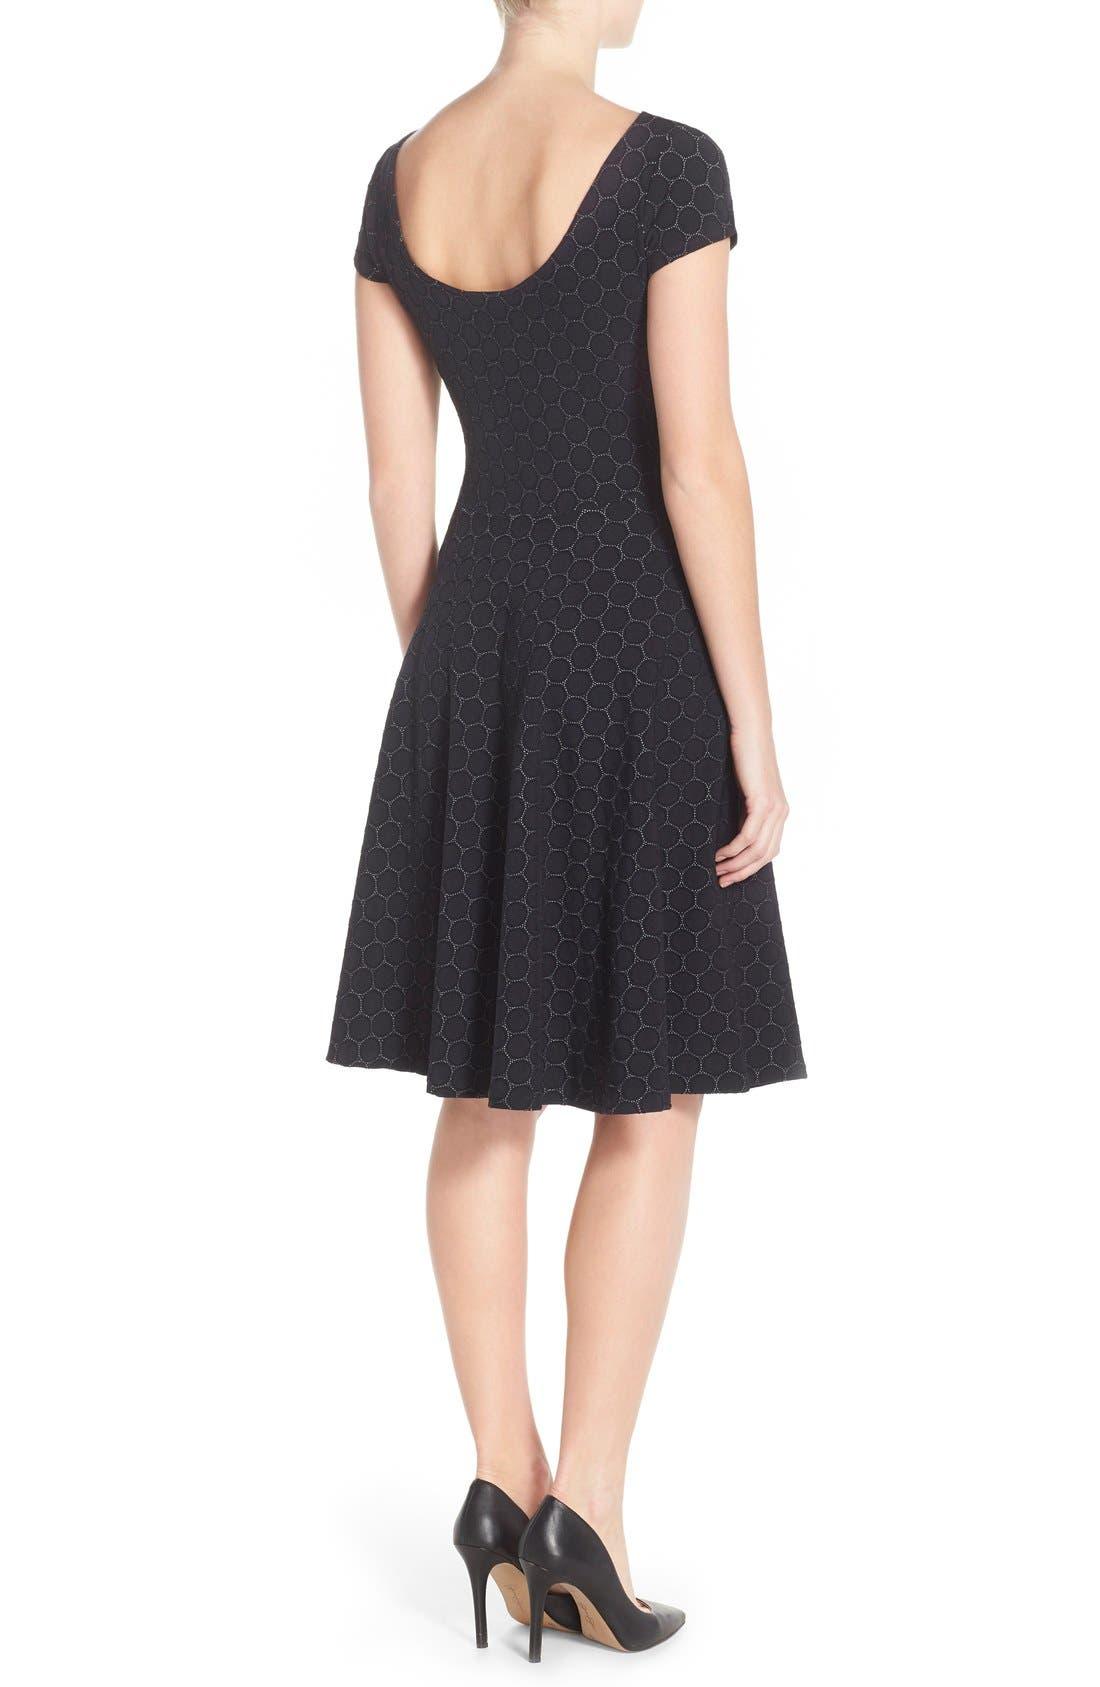 LEOTA, 'Circle' Jacquard Woven Jersey Dress, Alternate thumbnail 2, color, BLACK CAMEO CLOTH